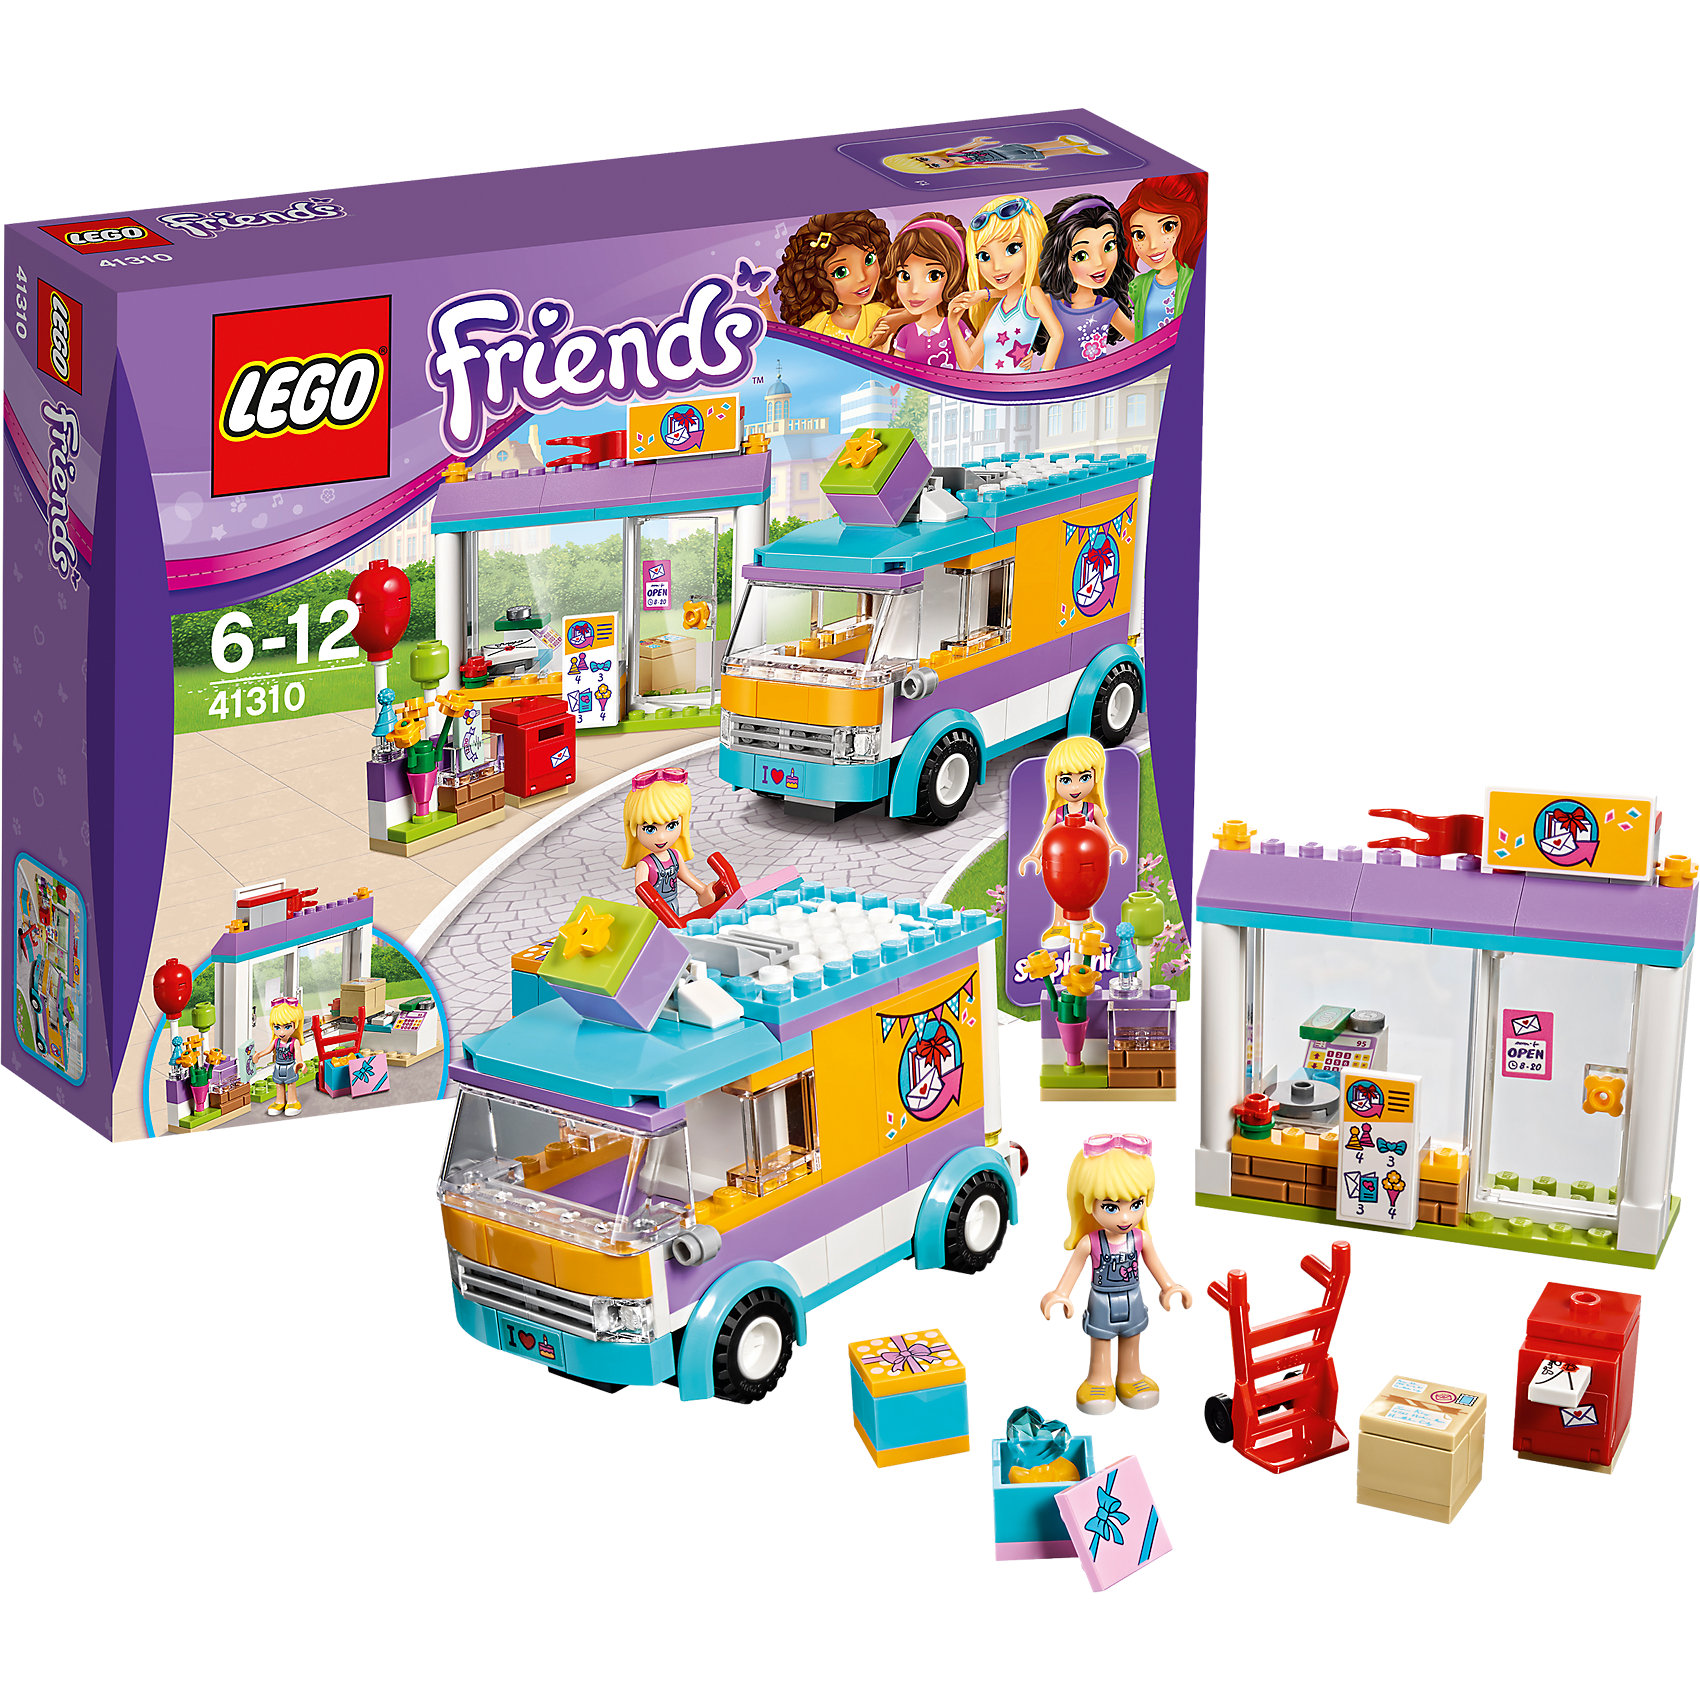 LEGO Friends 41310: Служба доставки подарков<br><br>Ширина мм: 257<br>Глубина мм: 192<br>Высота мм: 66<br>Вес г: 340<br>Возраст от месяцев: 72<br>Возраст до месяцев: 144<br>Пол: Женский<br>Возраст: Детский<br>SKU: 5002483